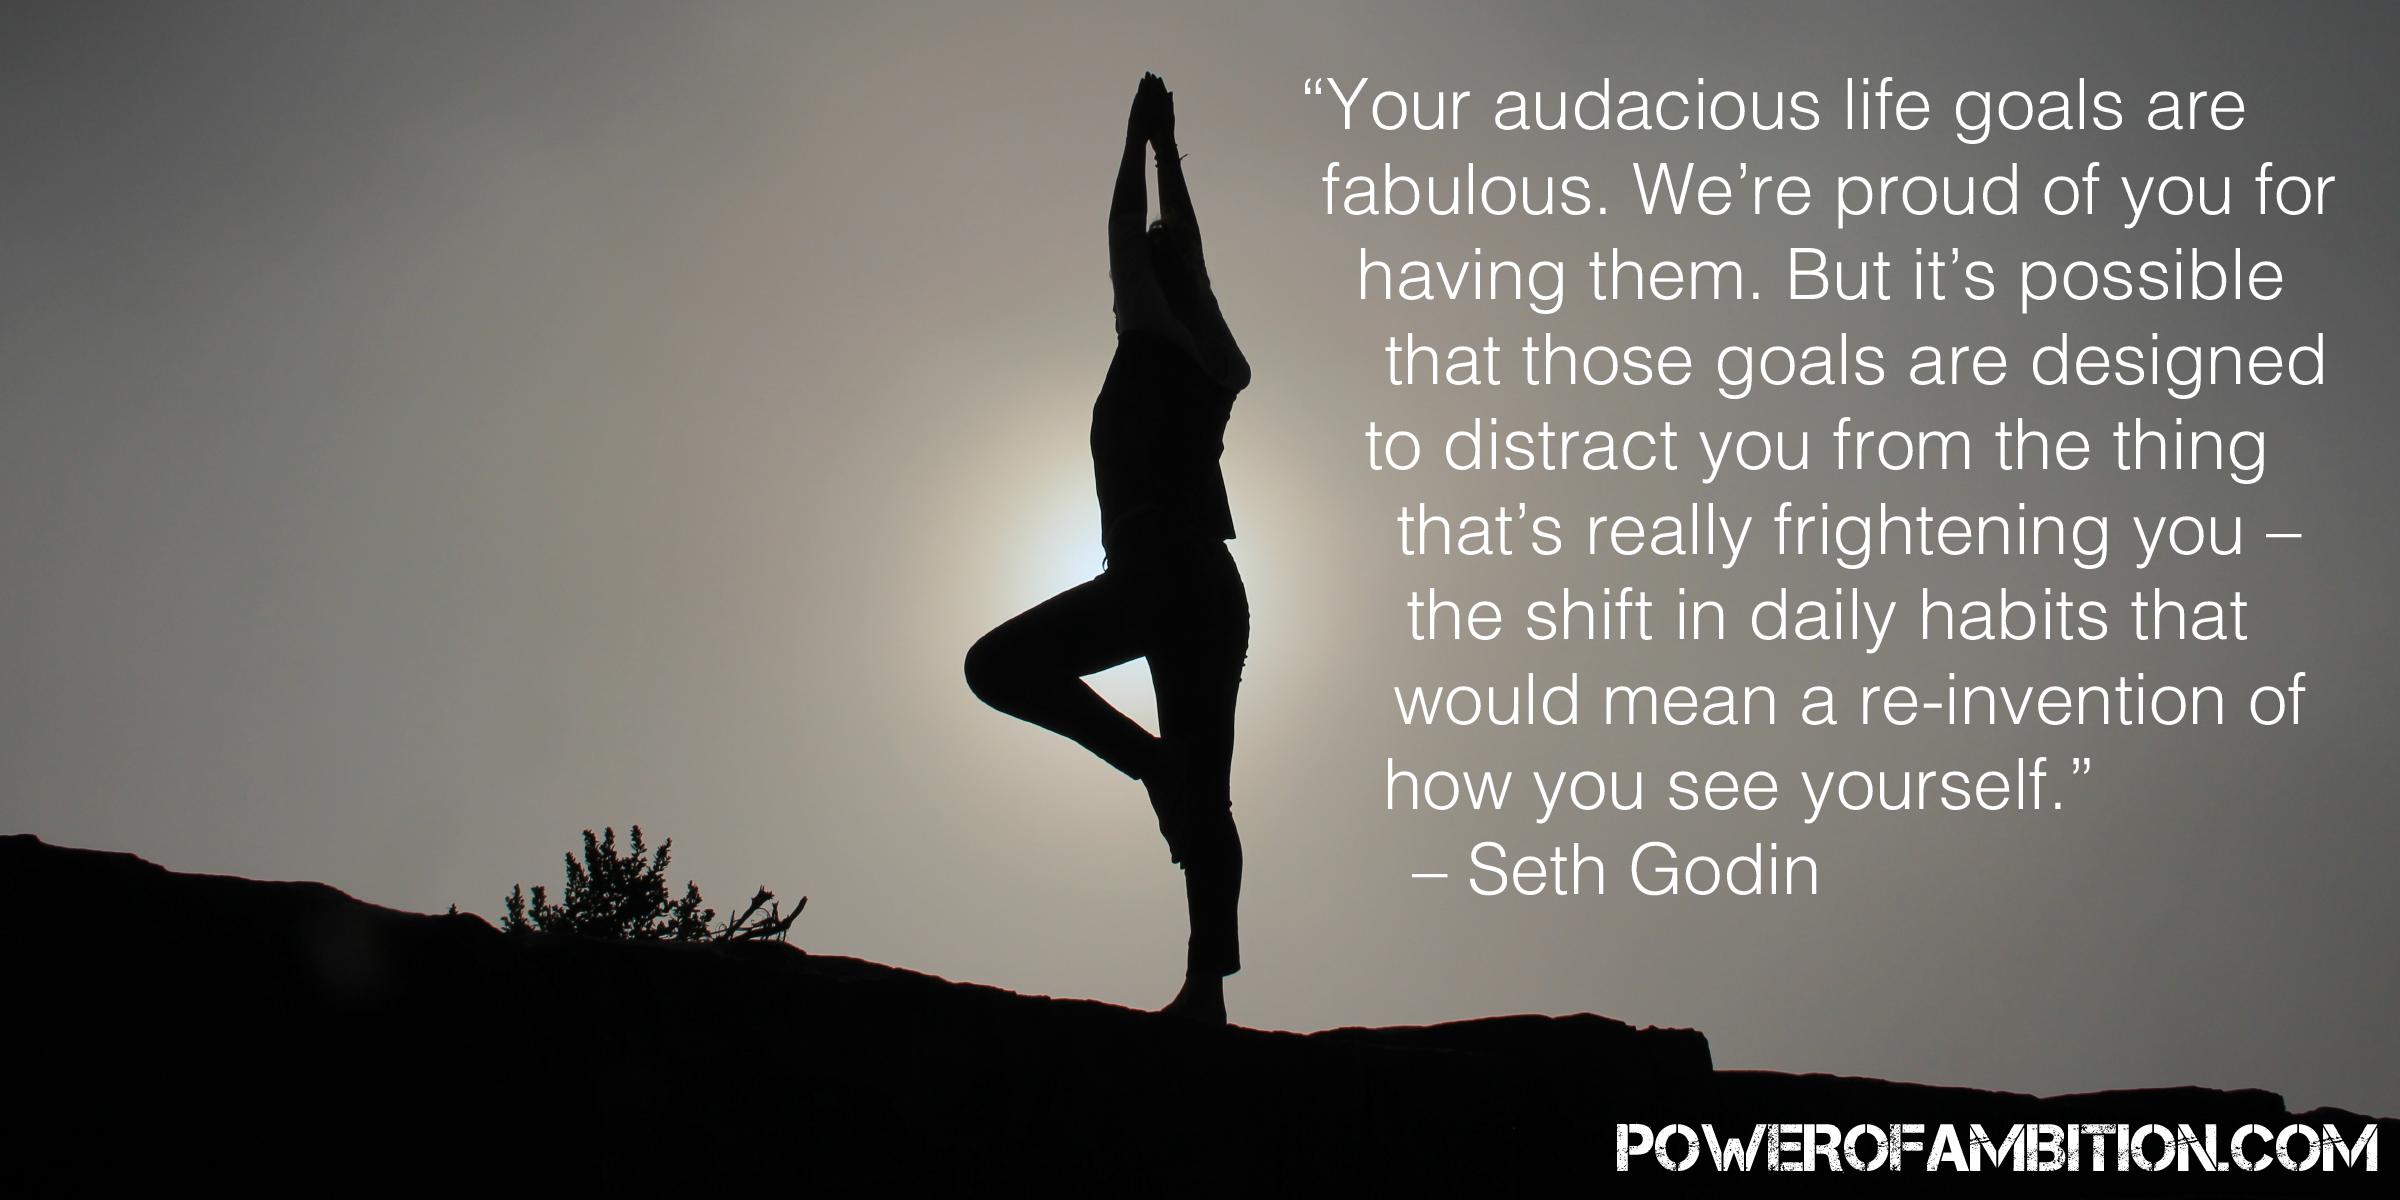 Your audacious life goals are fabulous - Seth Godin - POWEROFAMBITION.COM